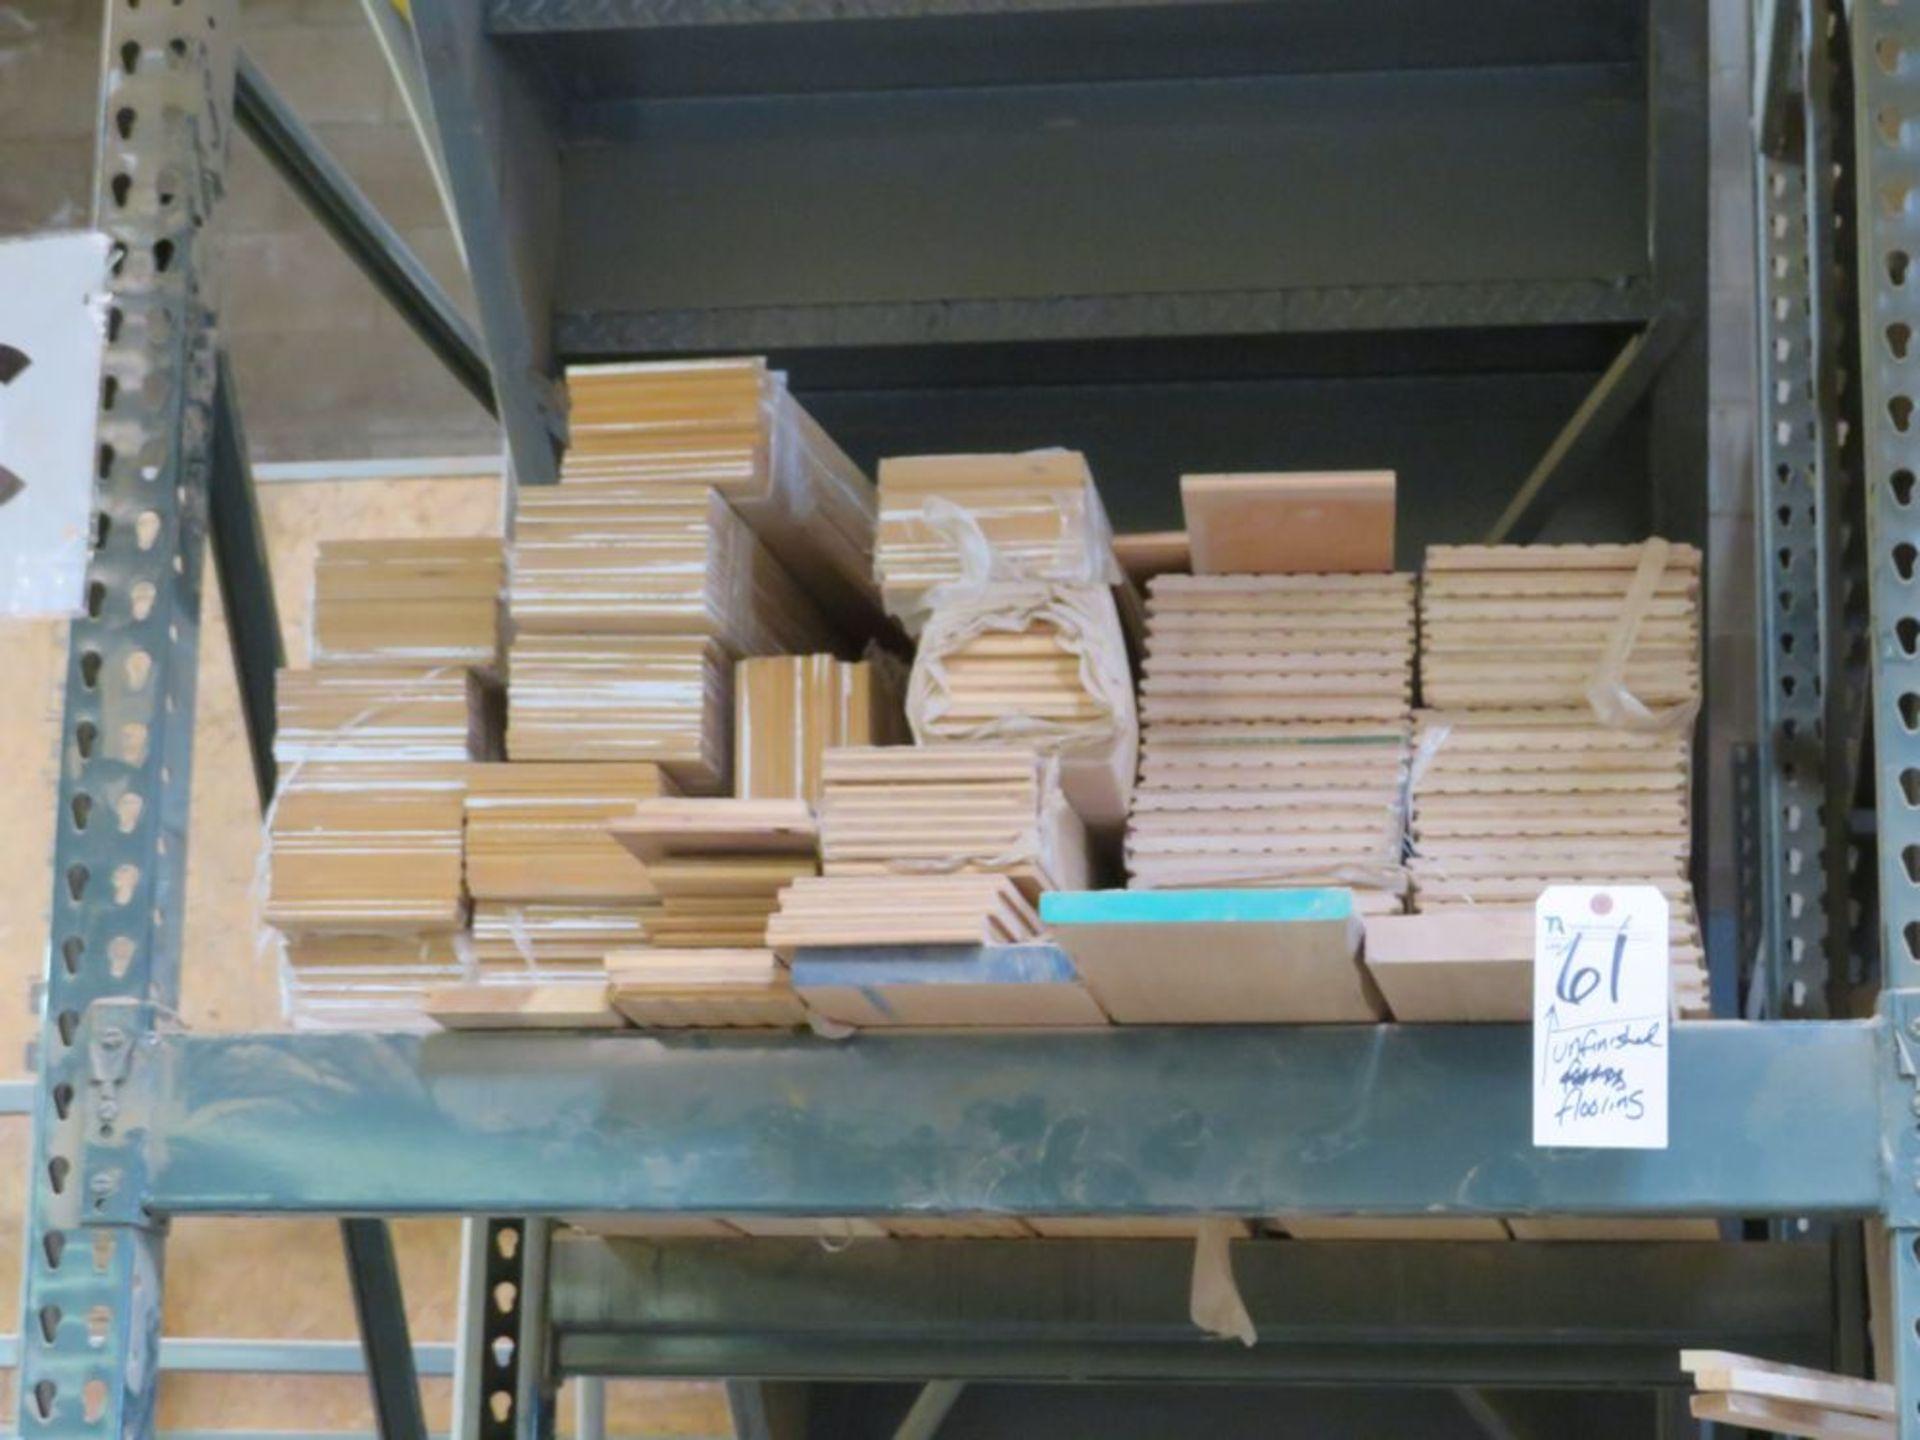 Lot 61 - (Lot) Unfinished Flooring Planks, Sel Cut